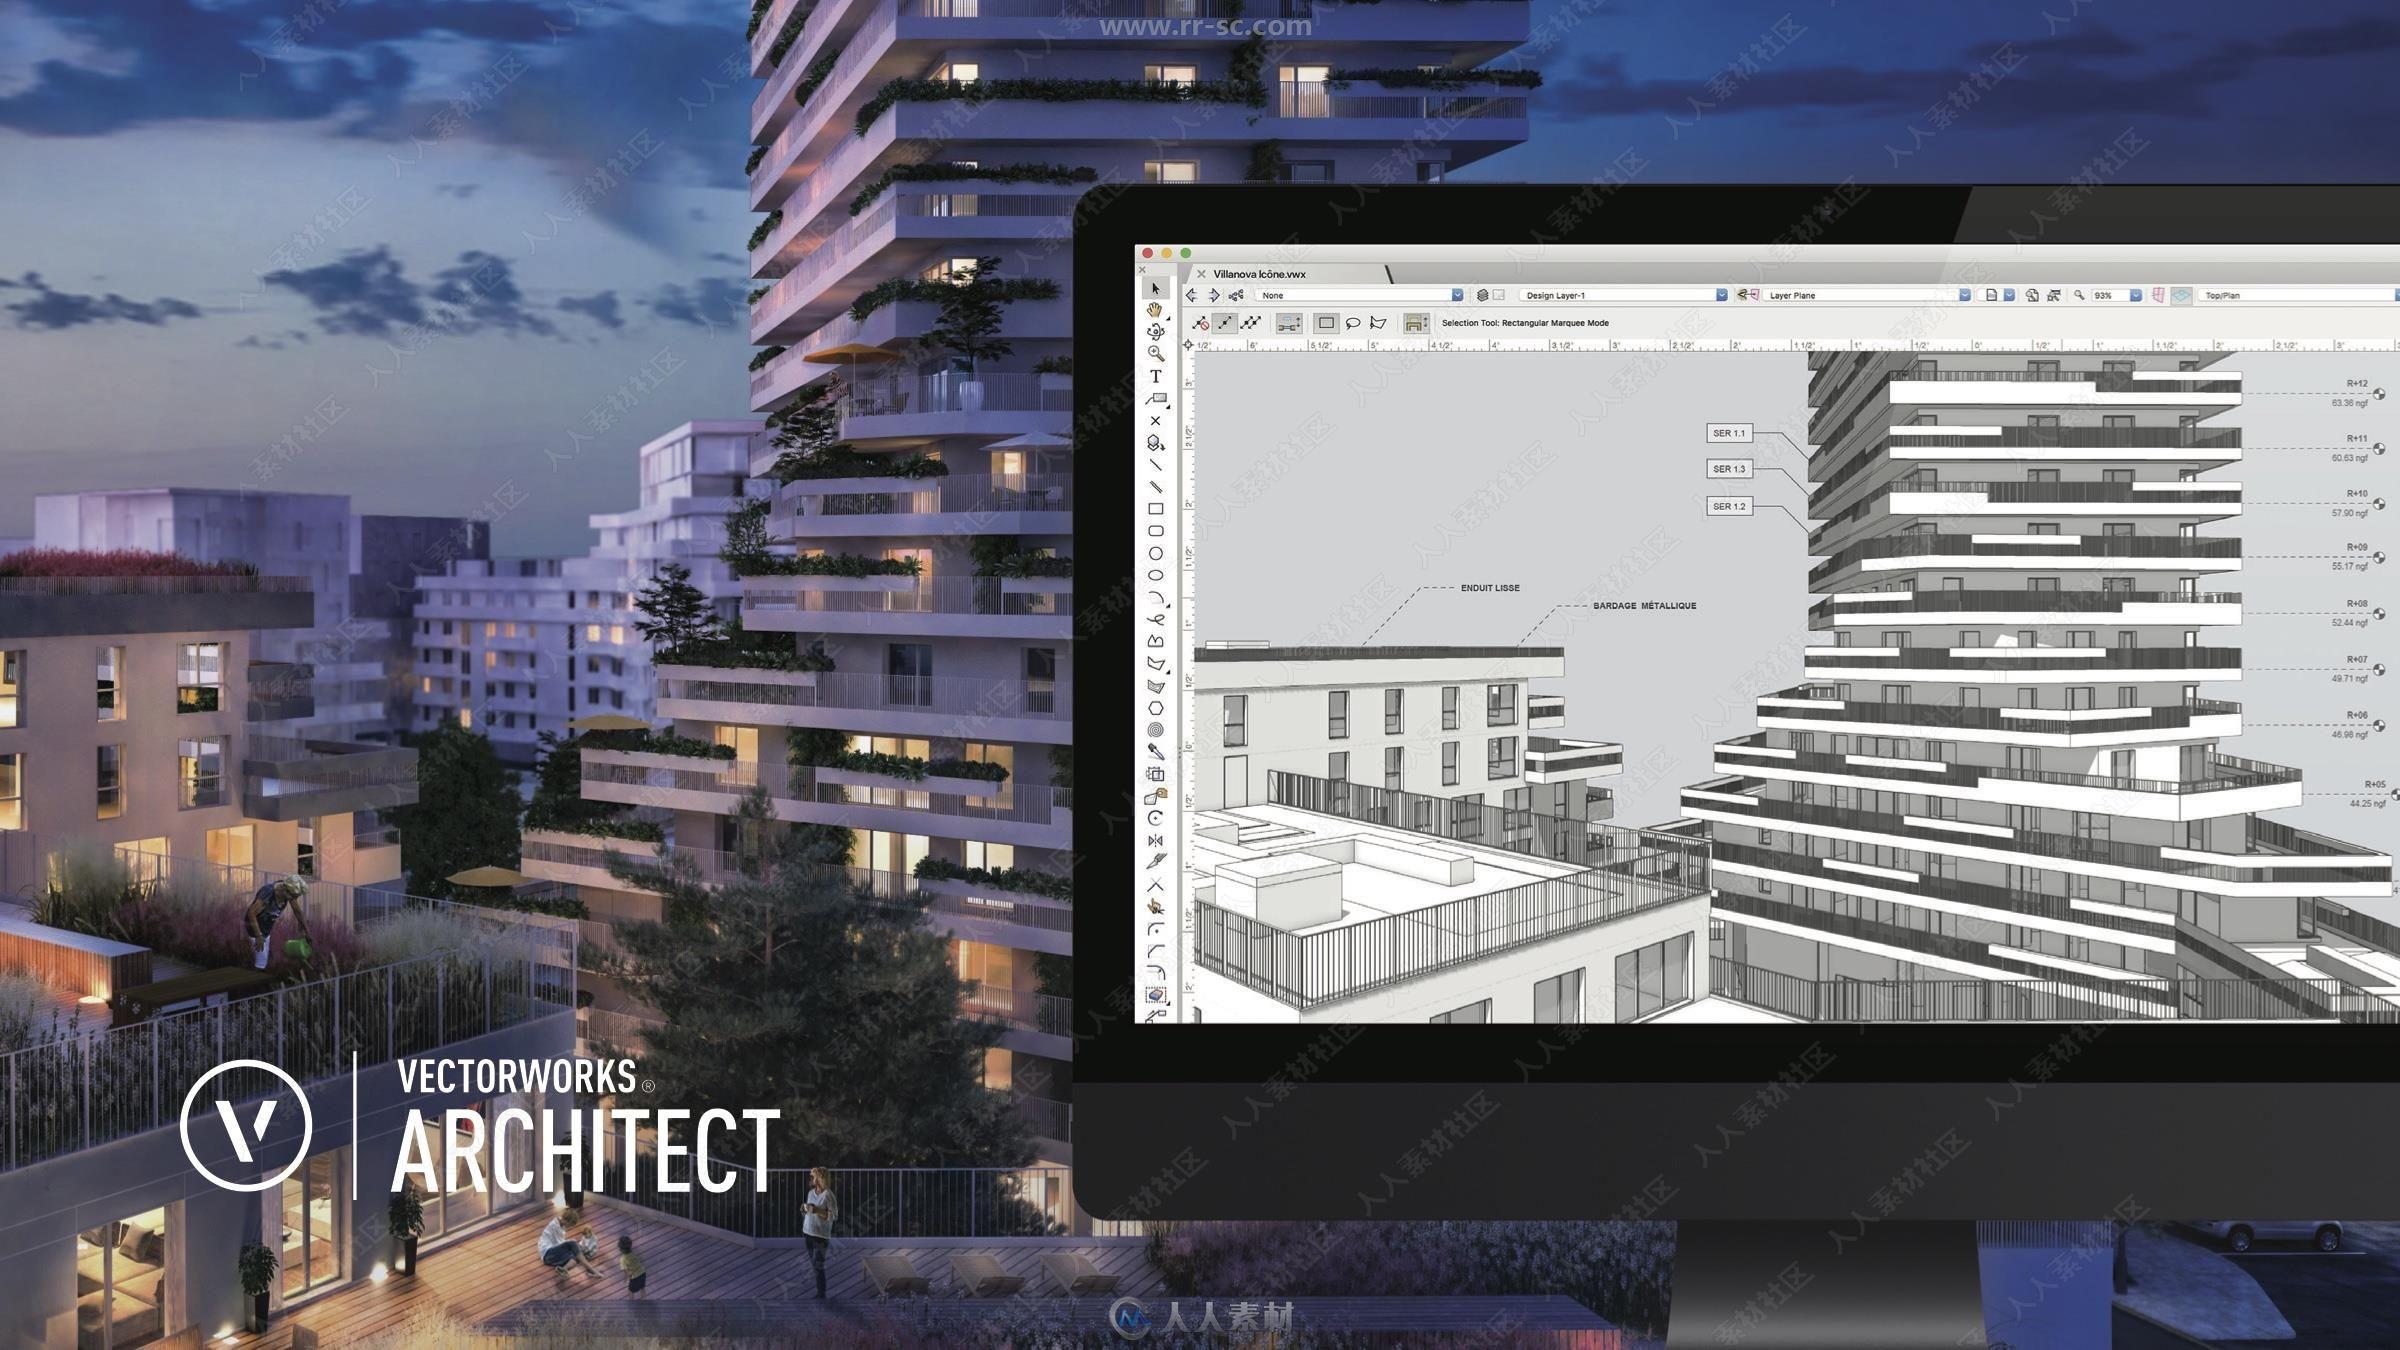 Vectorworks interiorcad 2020建筑与工业设计软件SP3.1版63 / 作者:抱着猫的老鼠 / 帖子ID:16762255,6527865